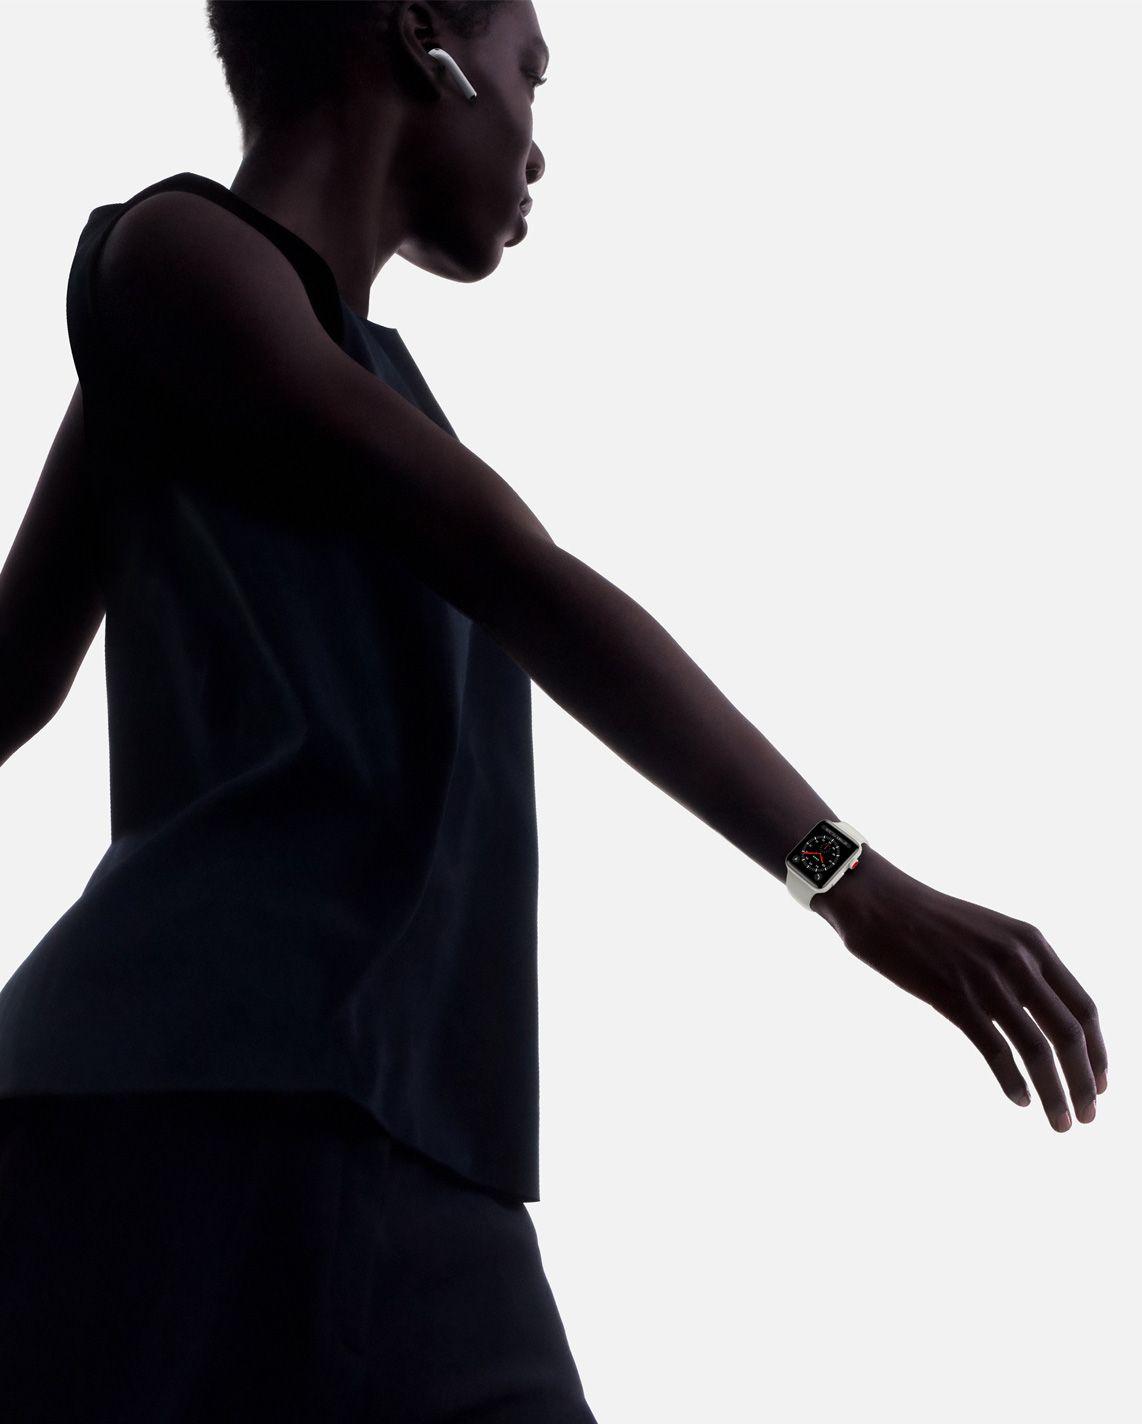 watch_series_3_walking_wristshot